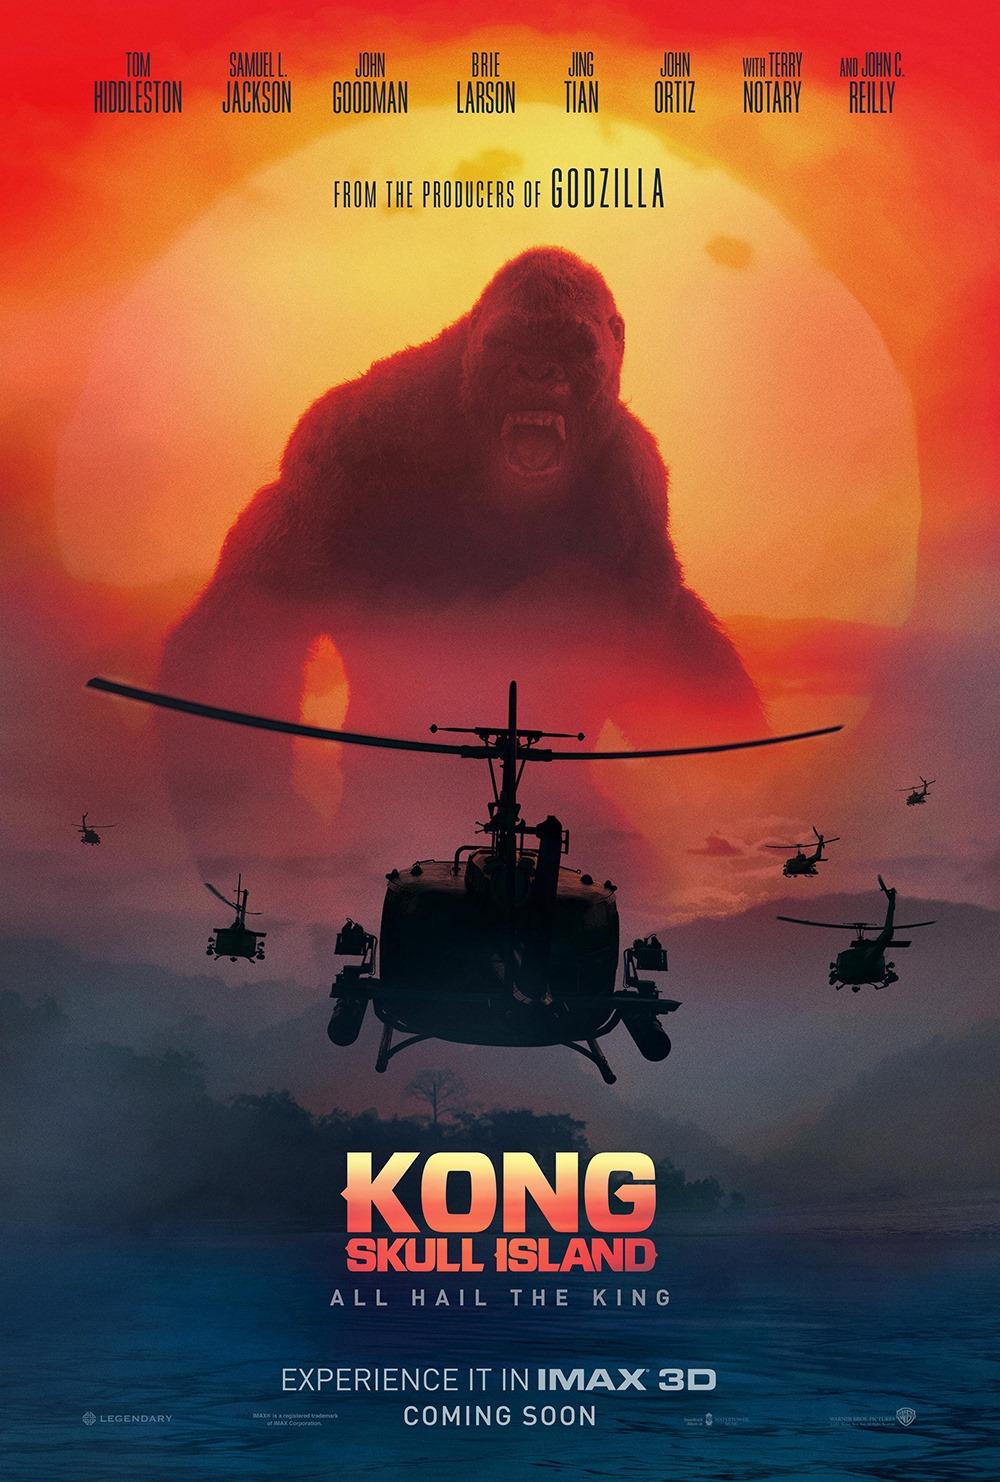 Imax Poster Kong Skull Island